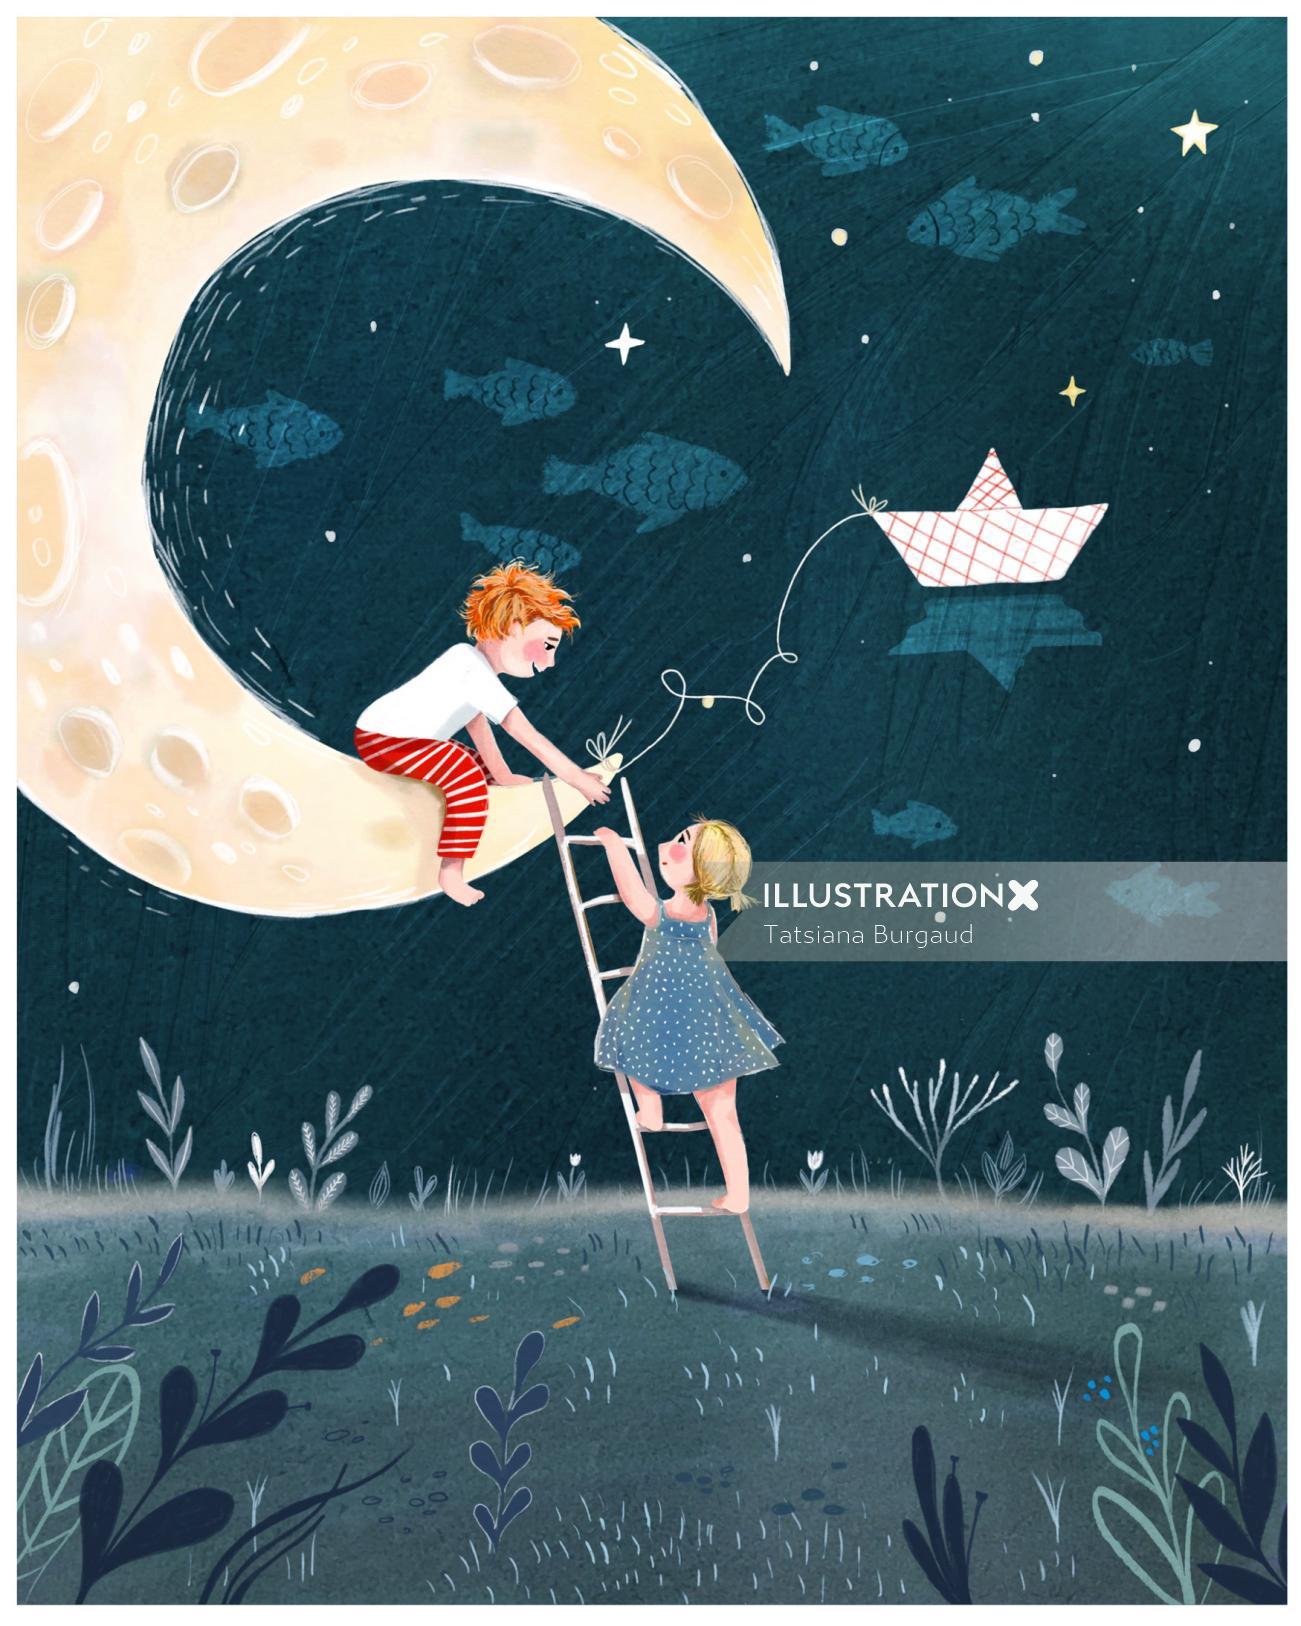 moon, night, children, climb, emotion